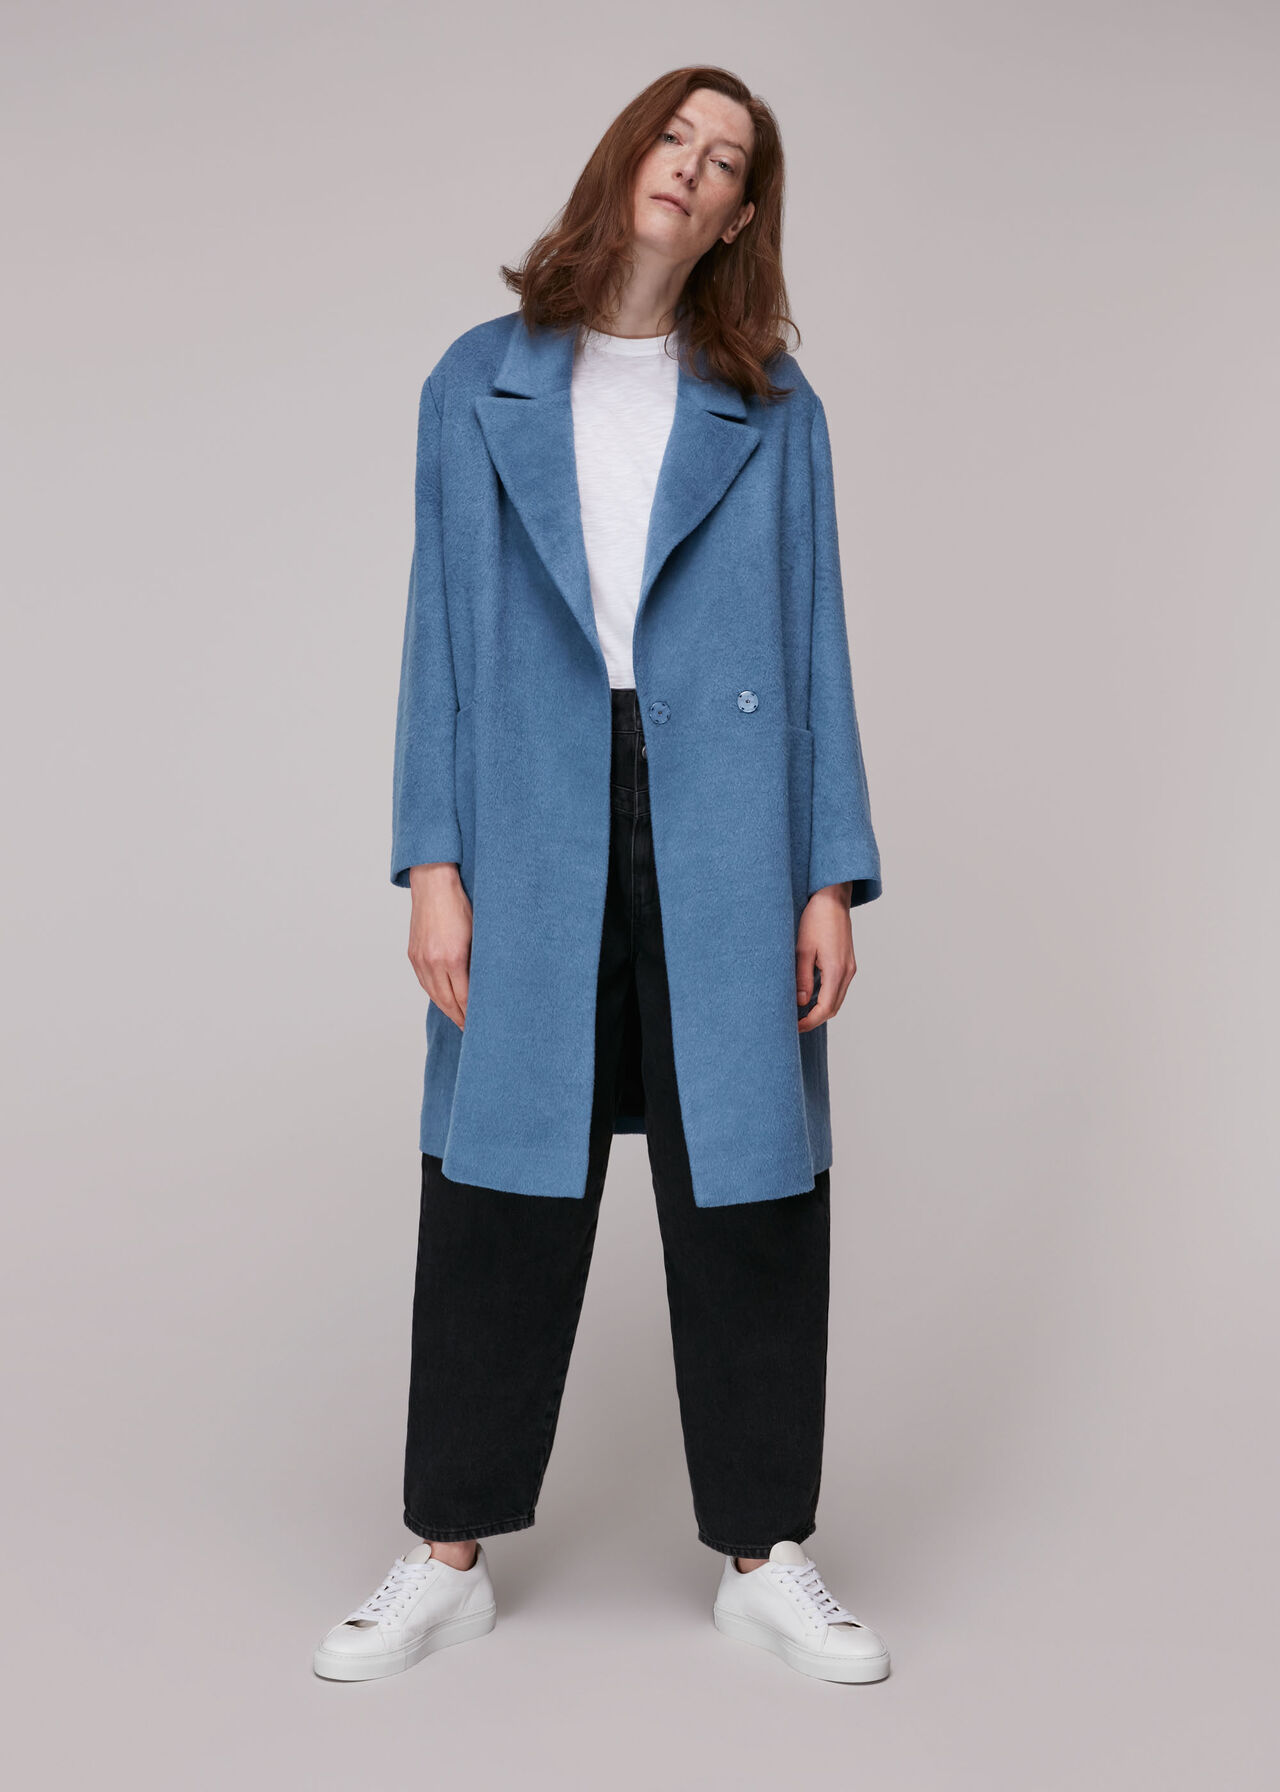 Lana Drawn Cocoon Coat